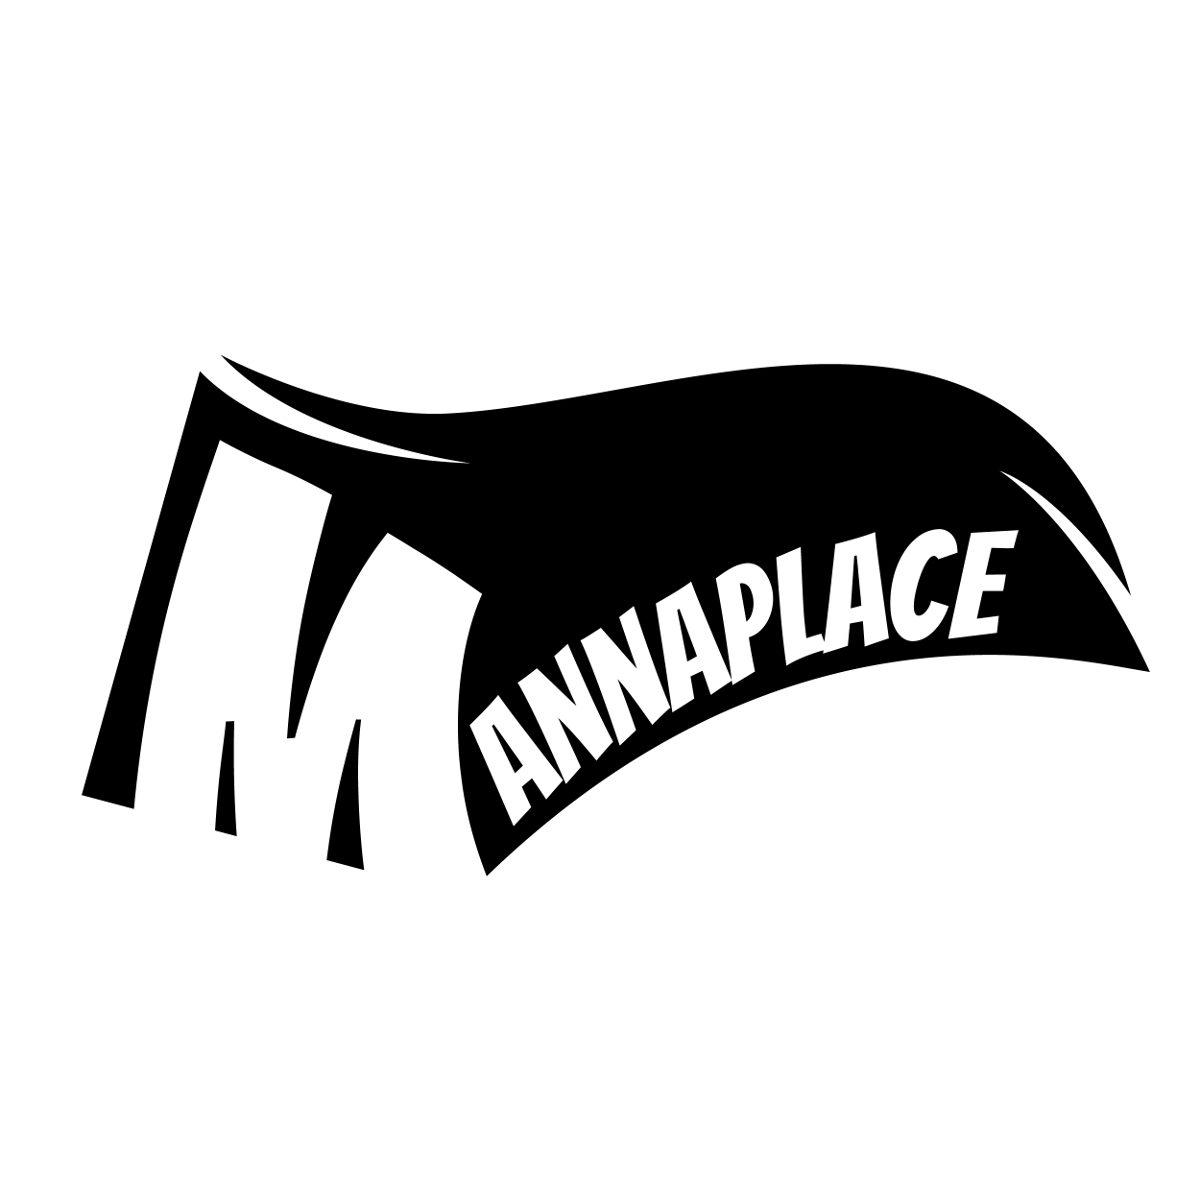 Mannaplace